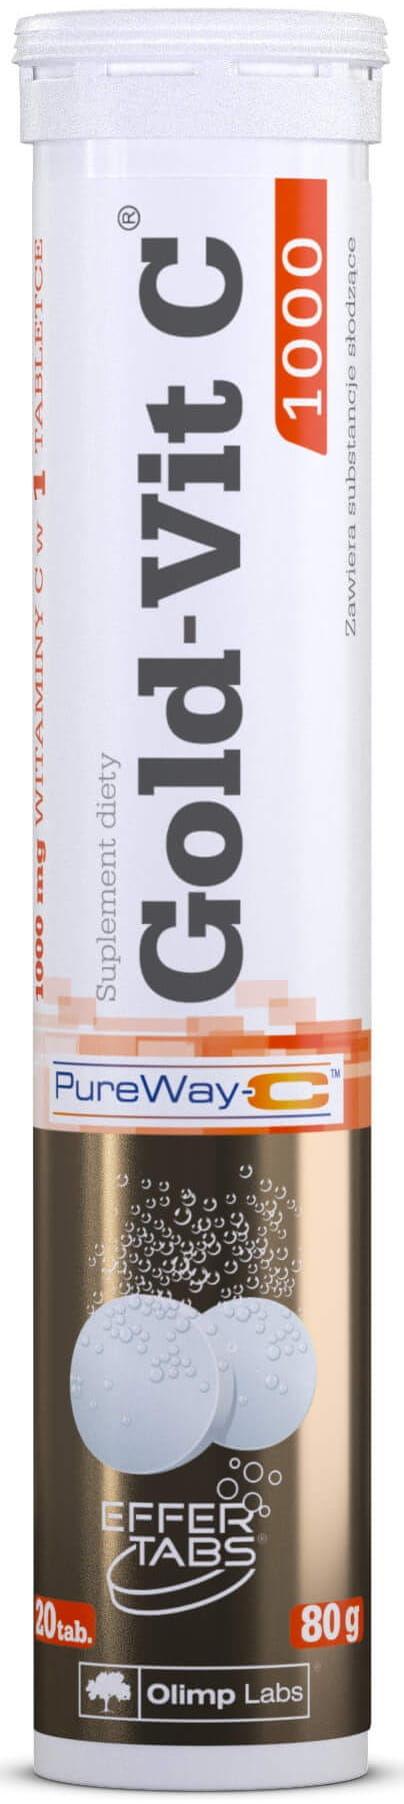 Gold-Vit C  1000 Smak Pomarańczowy Suplement Diety 20 Tabletek Musujących - Olimp Labs